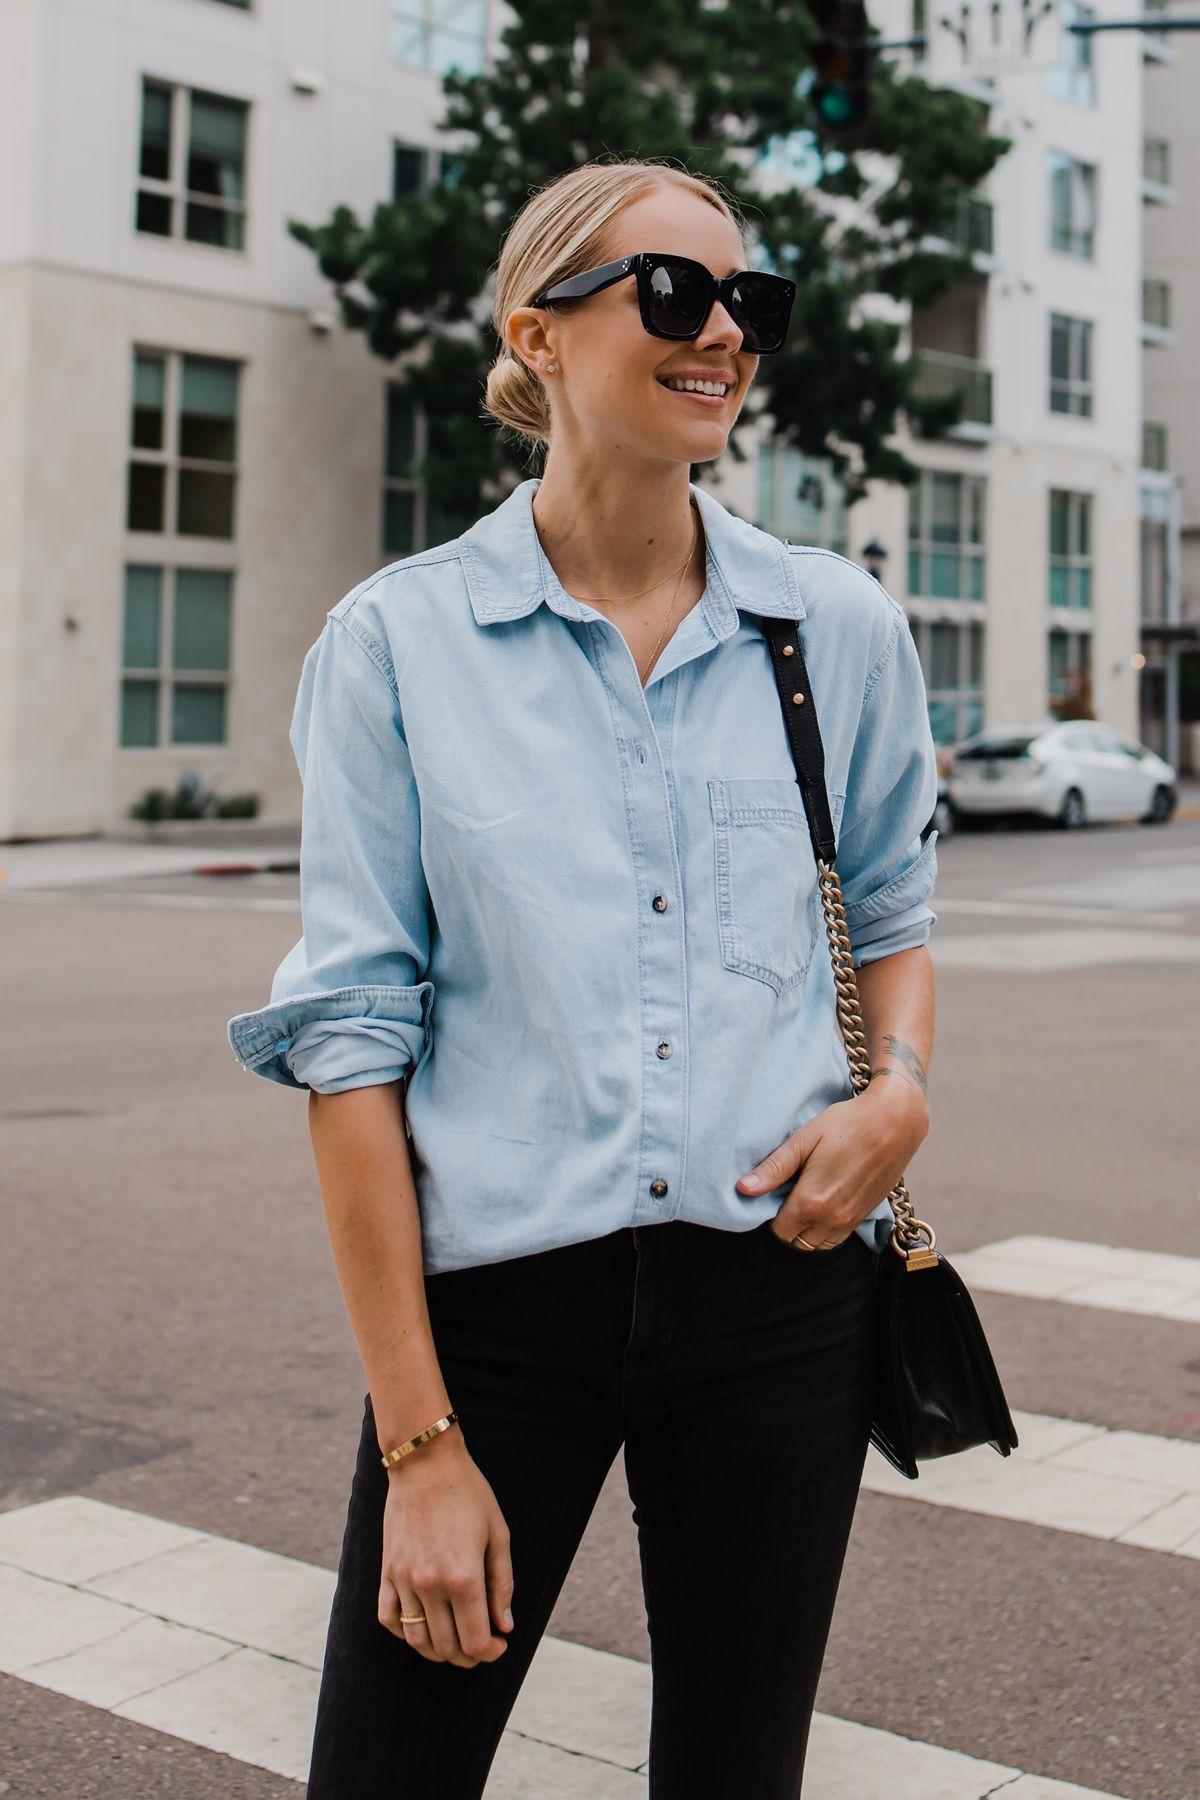 d85e0bdb670 Blonde Woman Wearing Topshop Oversized Denim Shirt Topshop Black Skinny  Jeans Fashion Jackson San Diego Blogger Fashion Blogger Street Style